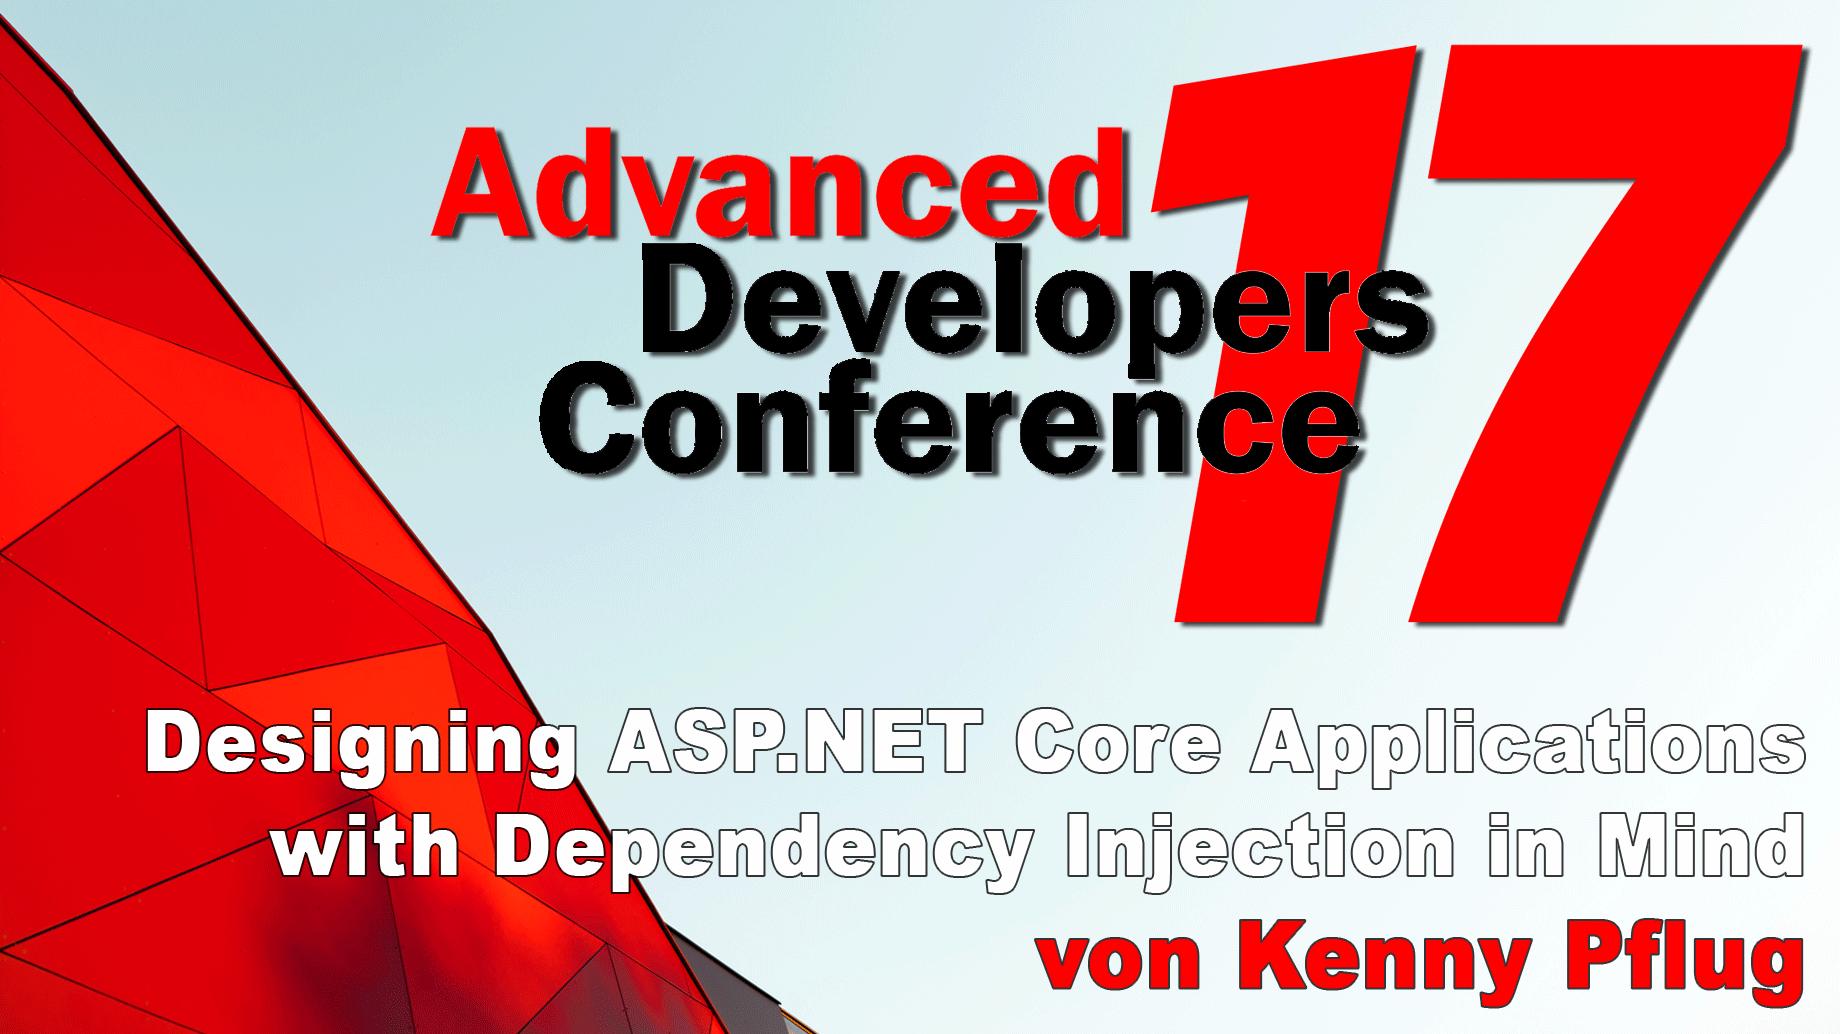 2017/ADC_net_core/Vortrag1-Designing-ASPNet-Core-Applications-KennyPflug